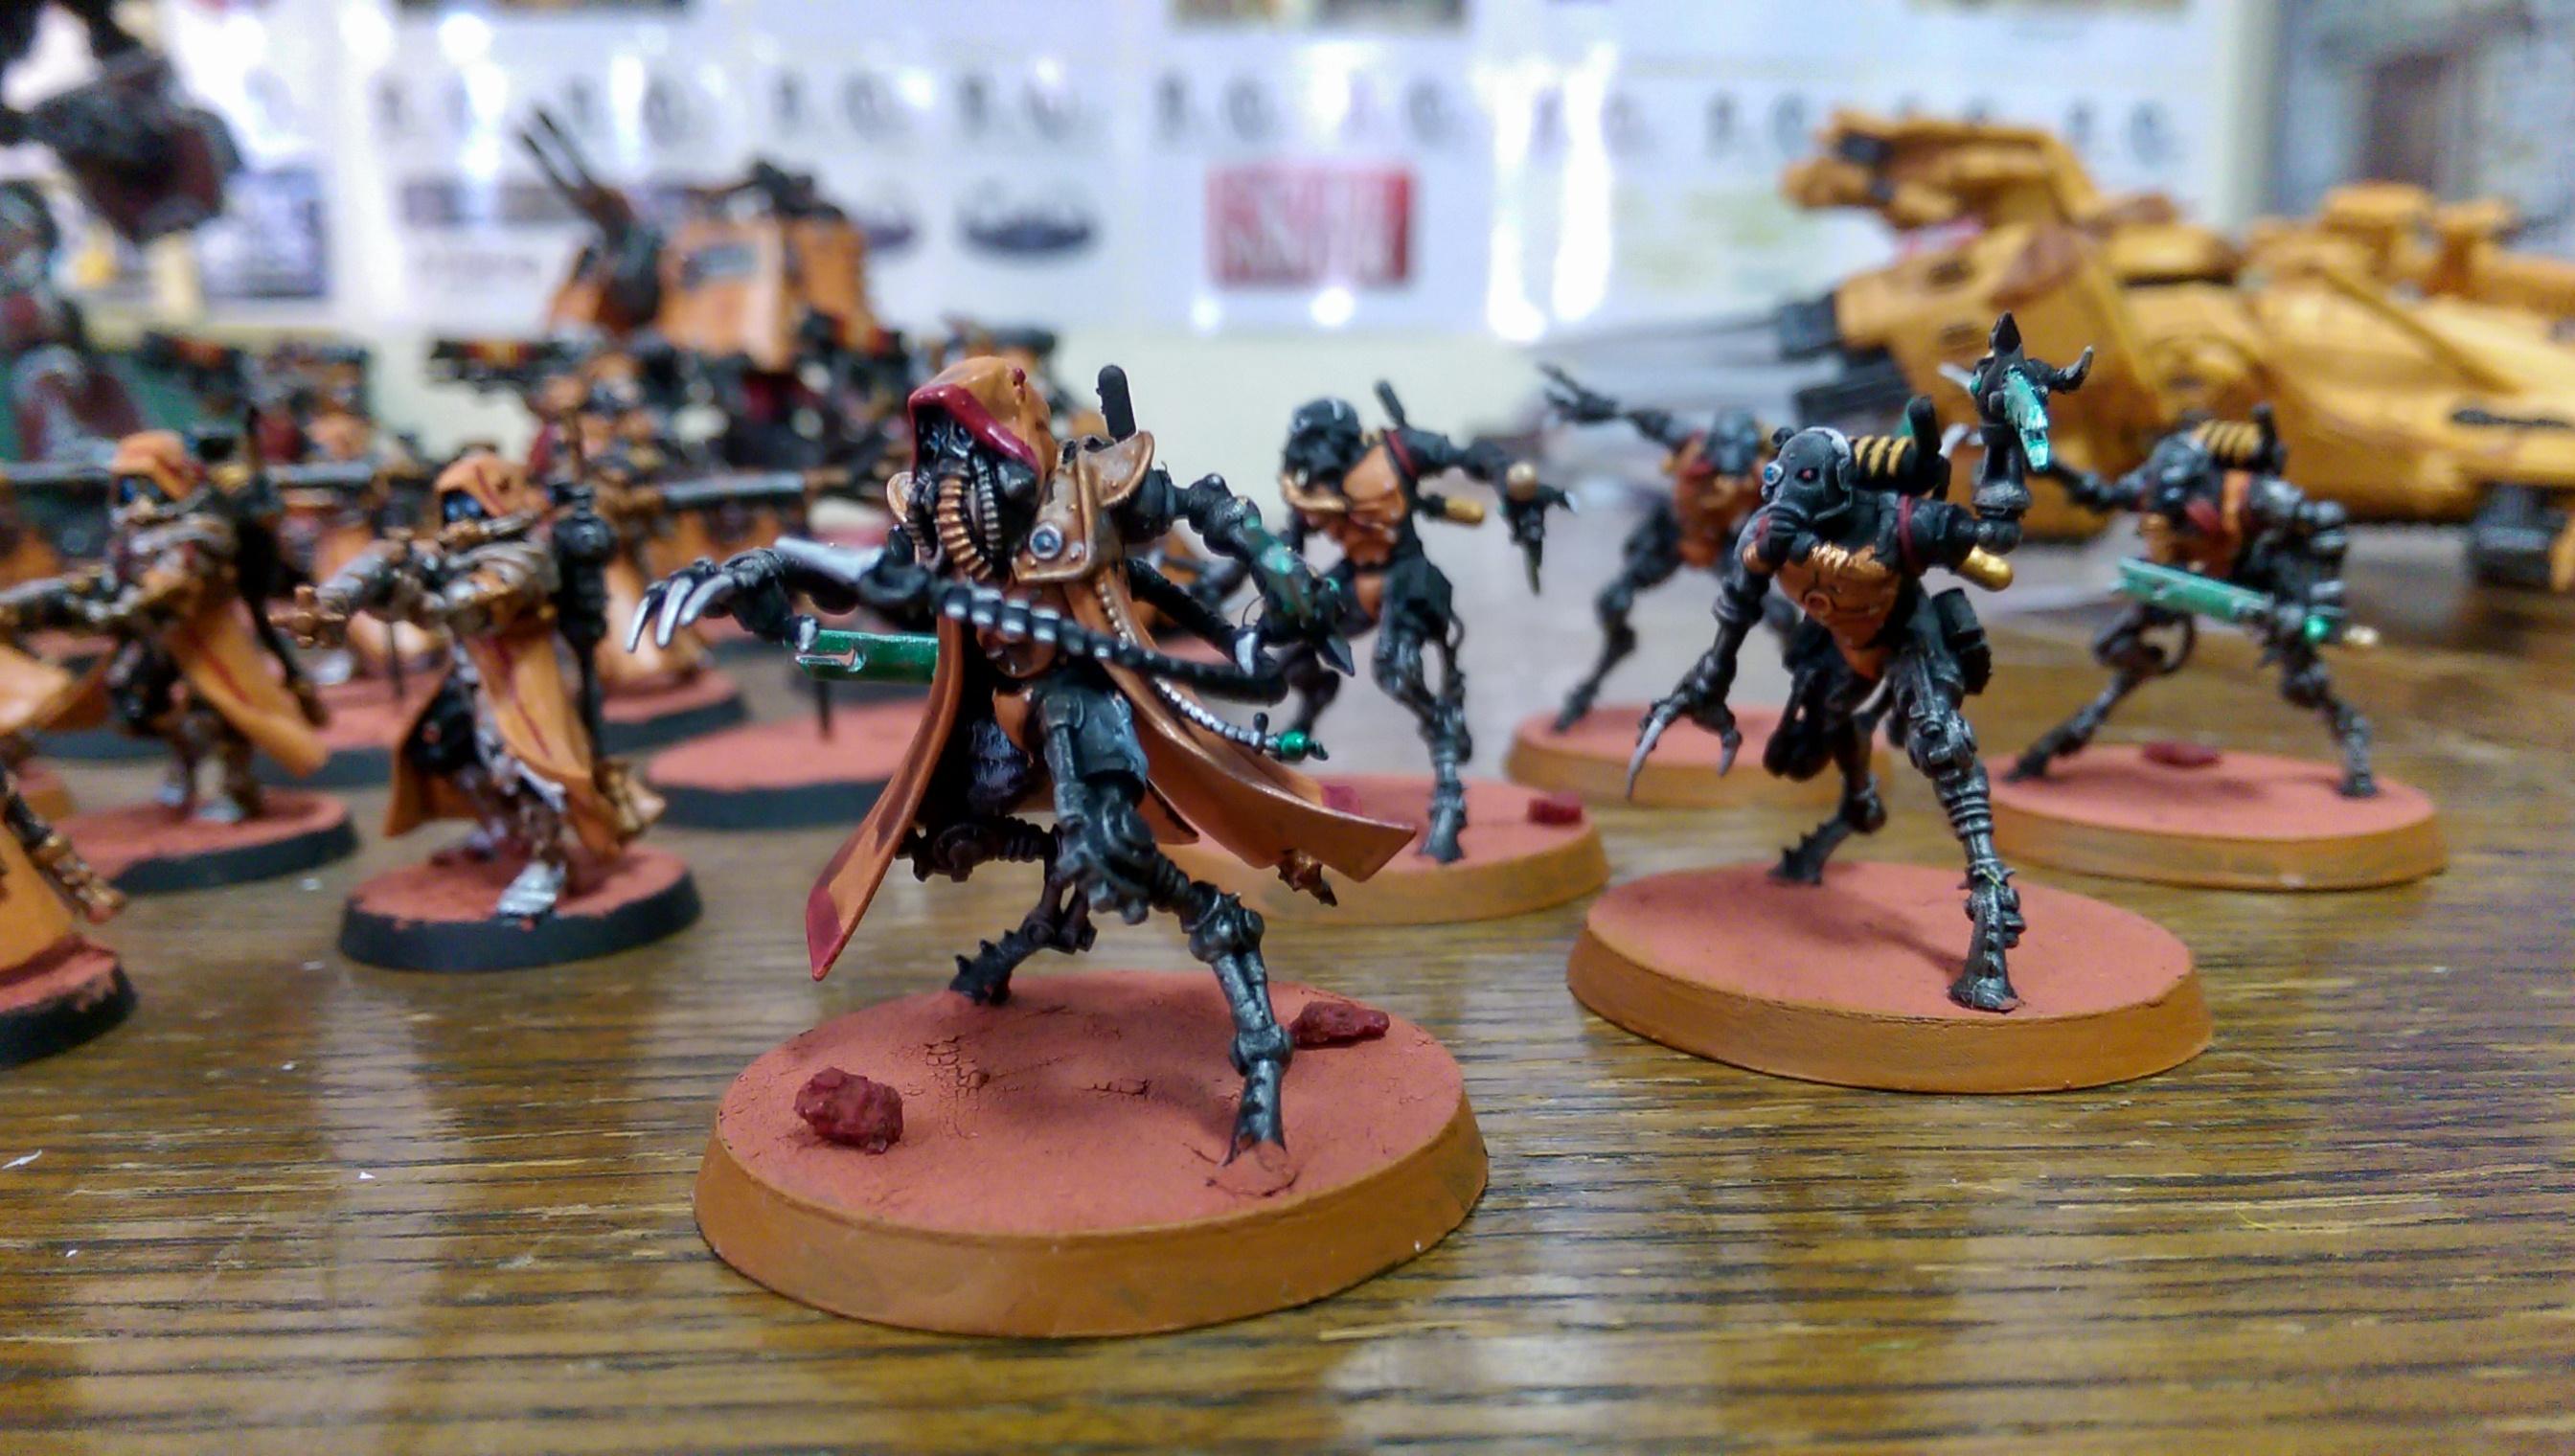 Agram, Arena, Etc, International, Tournament, Warhammer 40,000, Witch Hunters